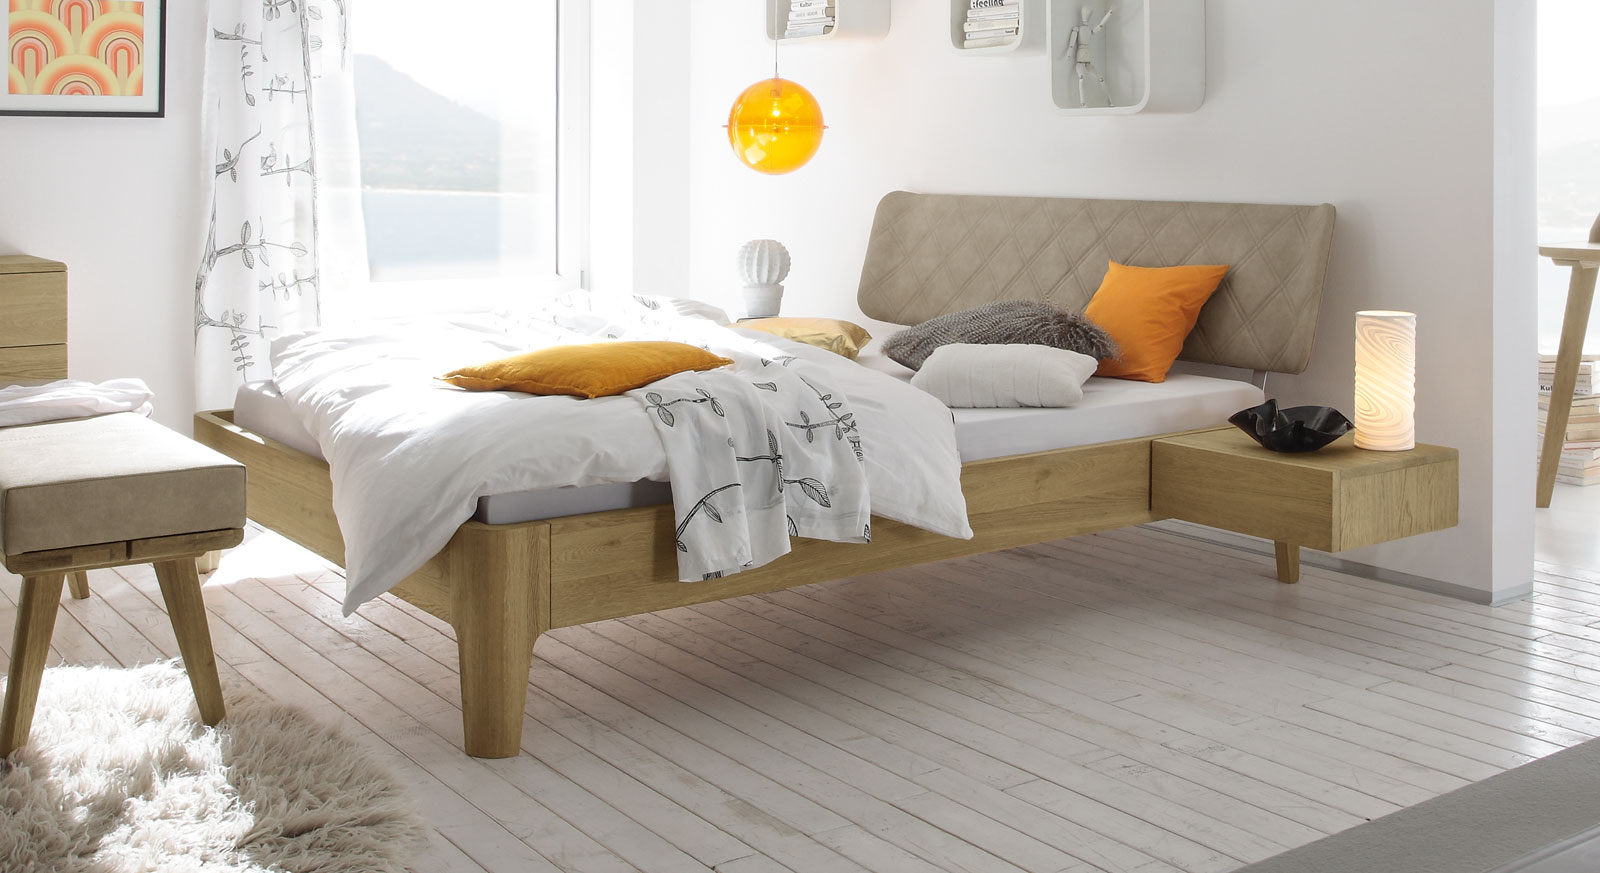 hygge die lebensphilosophie f r mehr gl cklichkeit. Black Bedroom Furniture Sets. Home Design Ideas